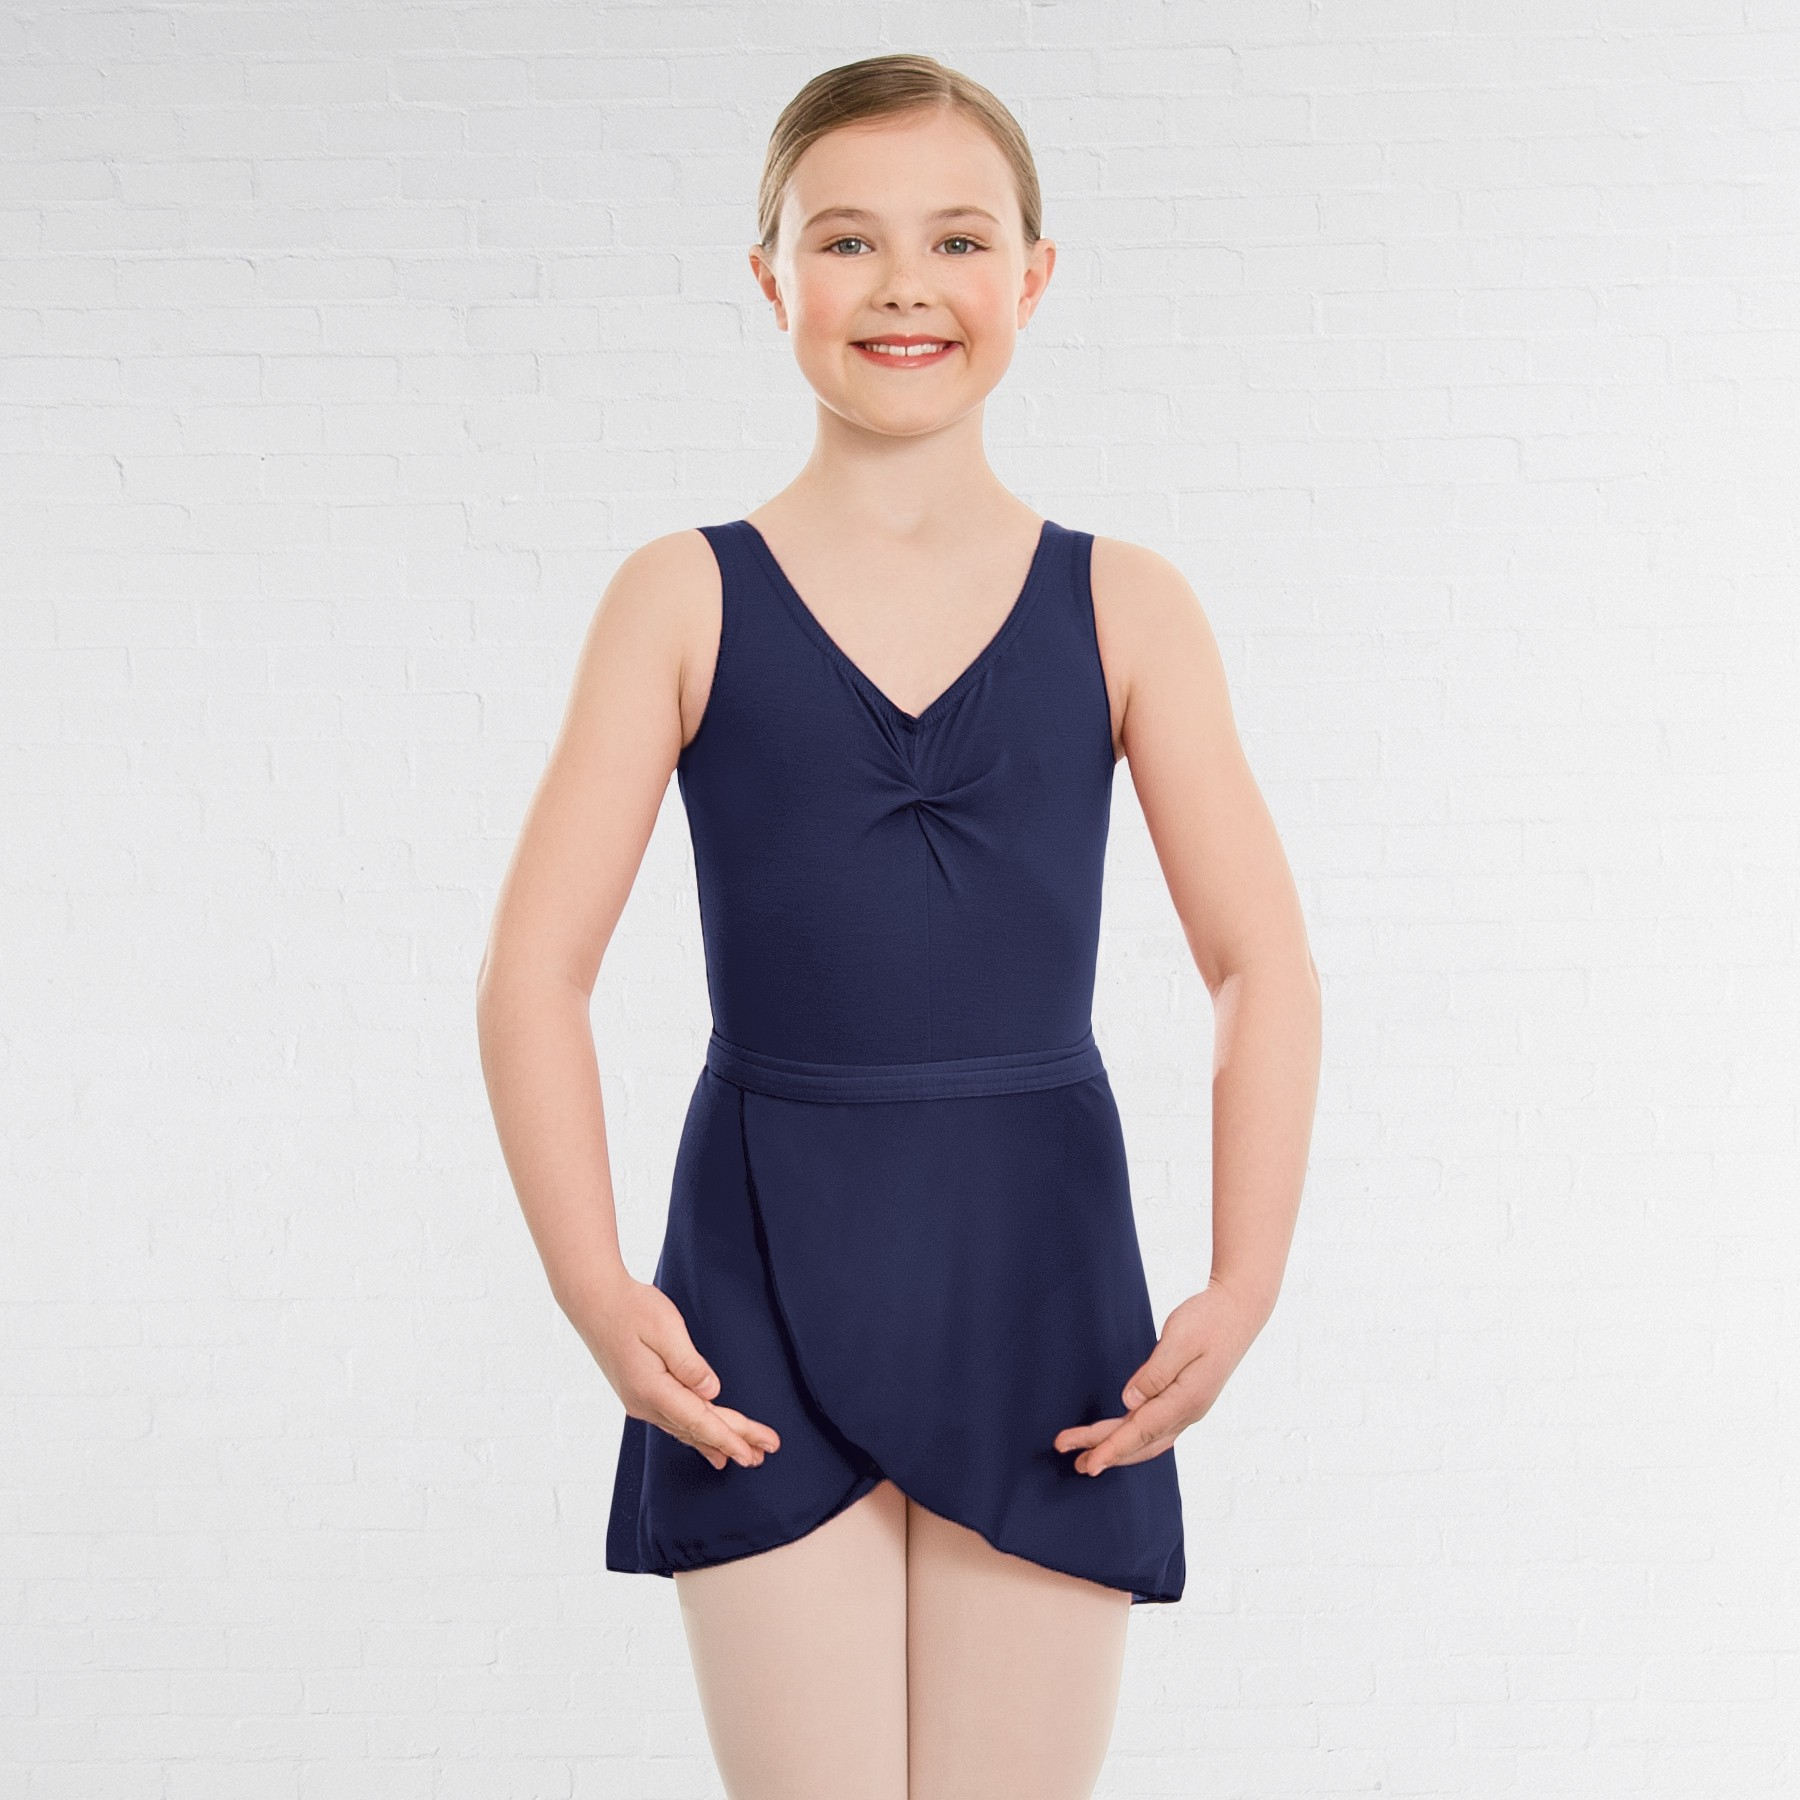 1st Position Wrapover Skirt (ISTD style) (Navy Blue)